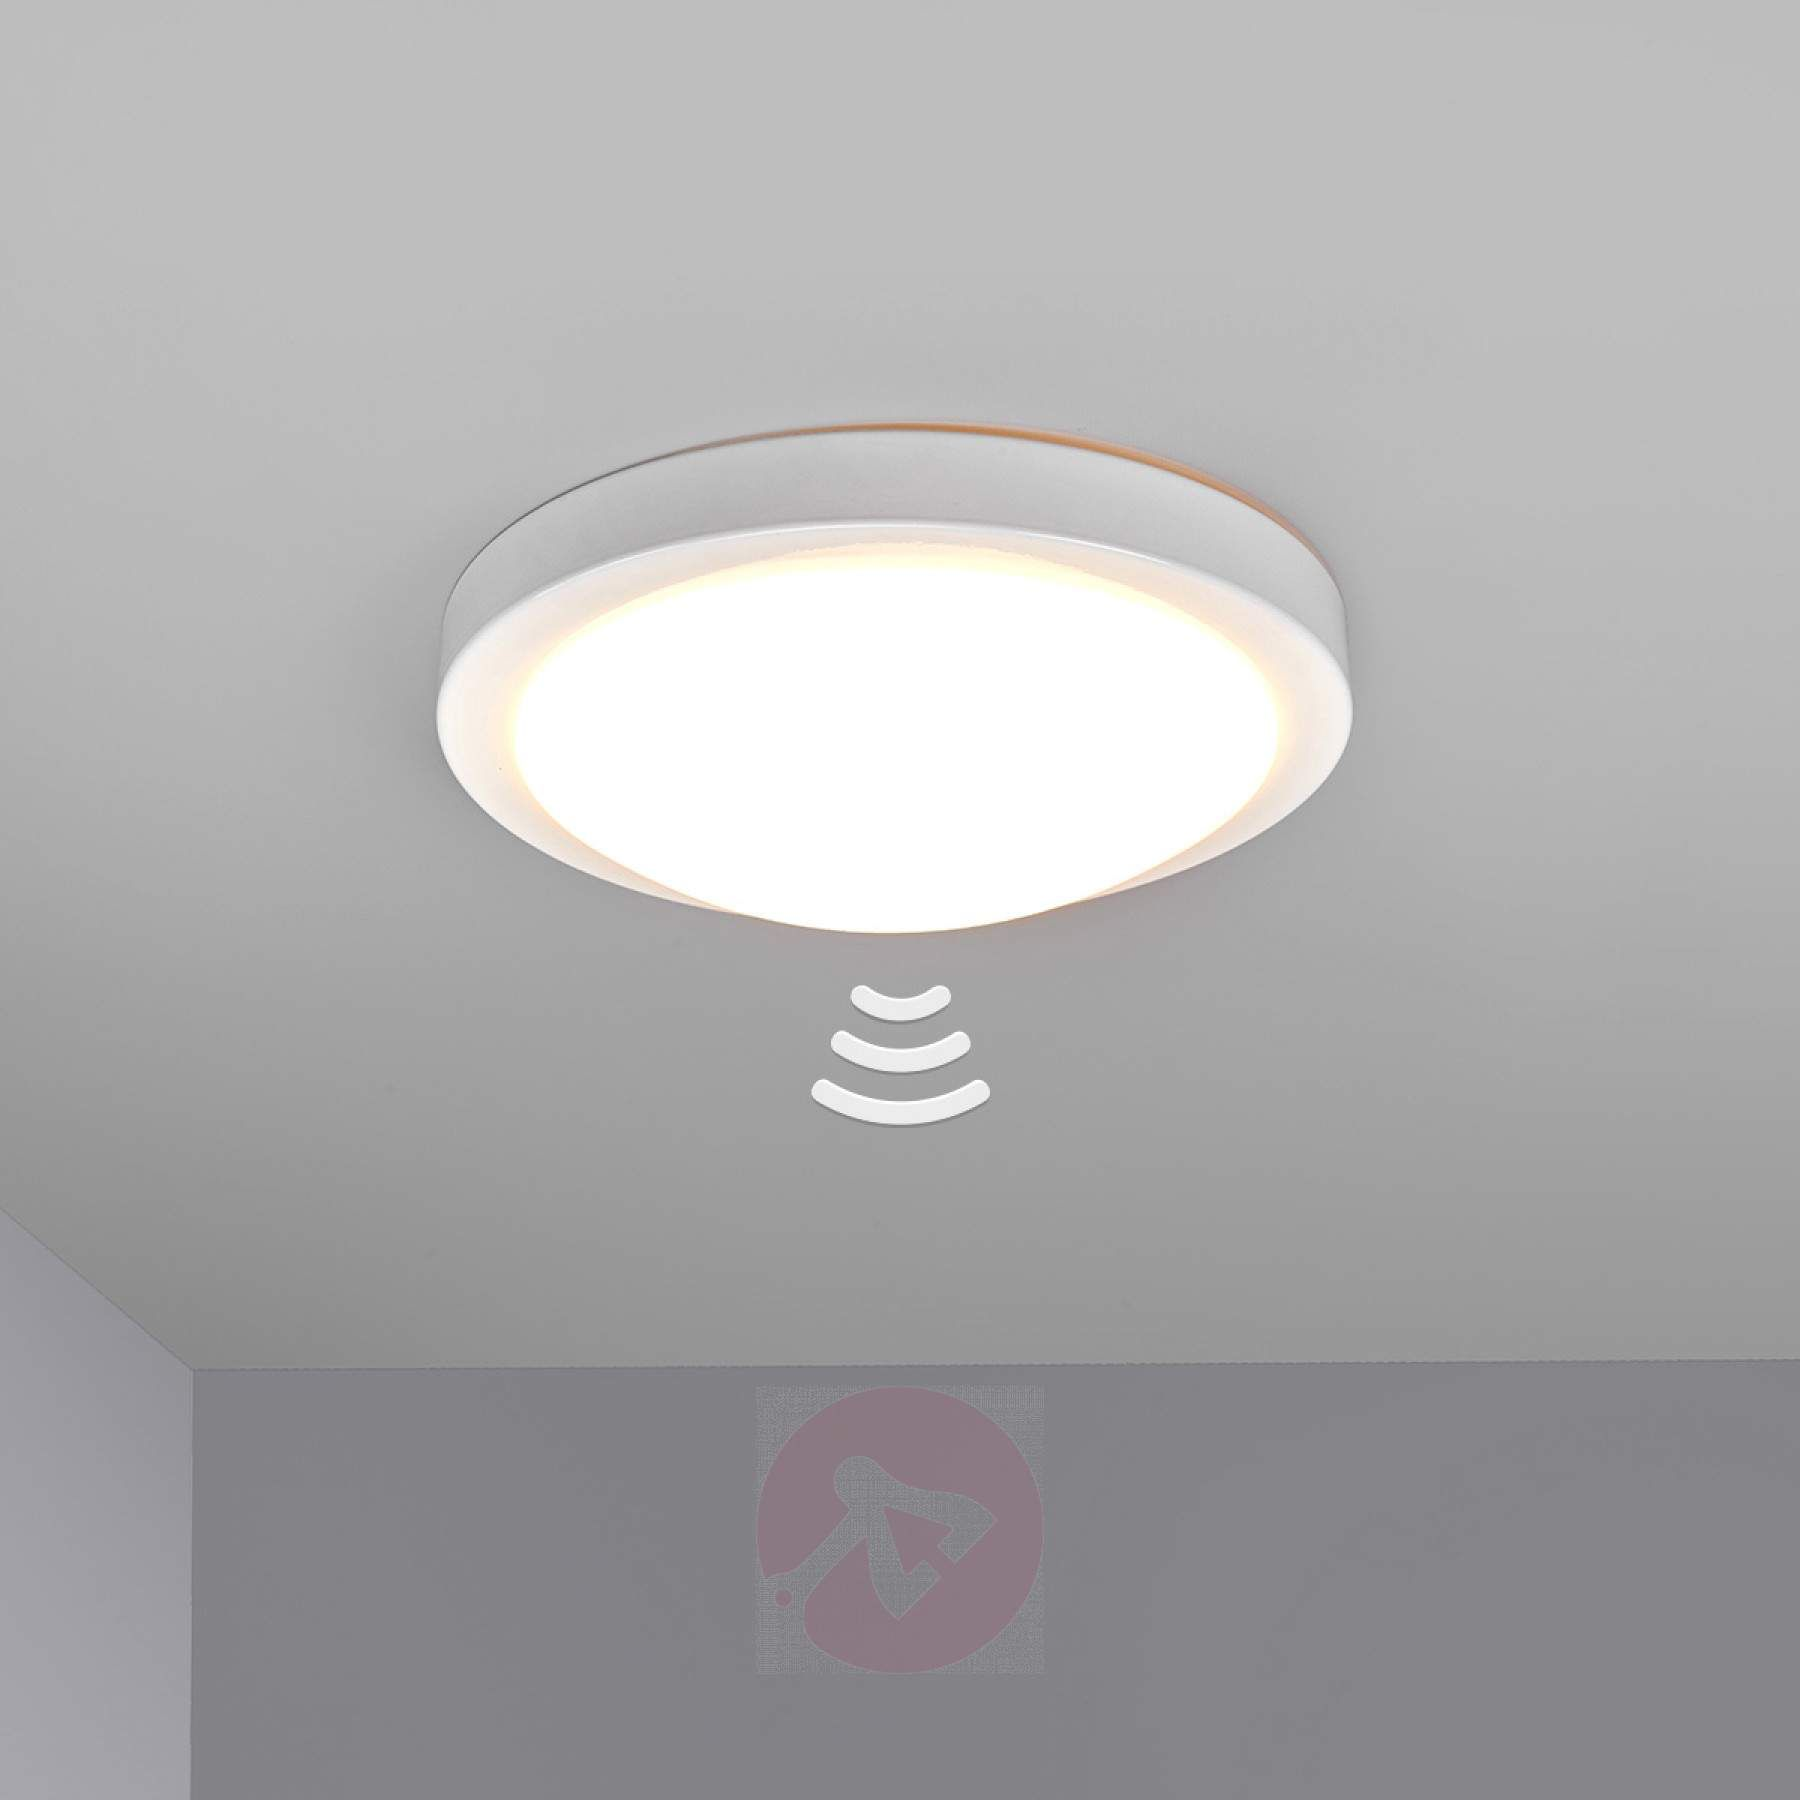 Witte badkamer-plafondlamp Aras met sensor en LED-9950525-01 ...